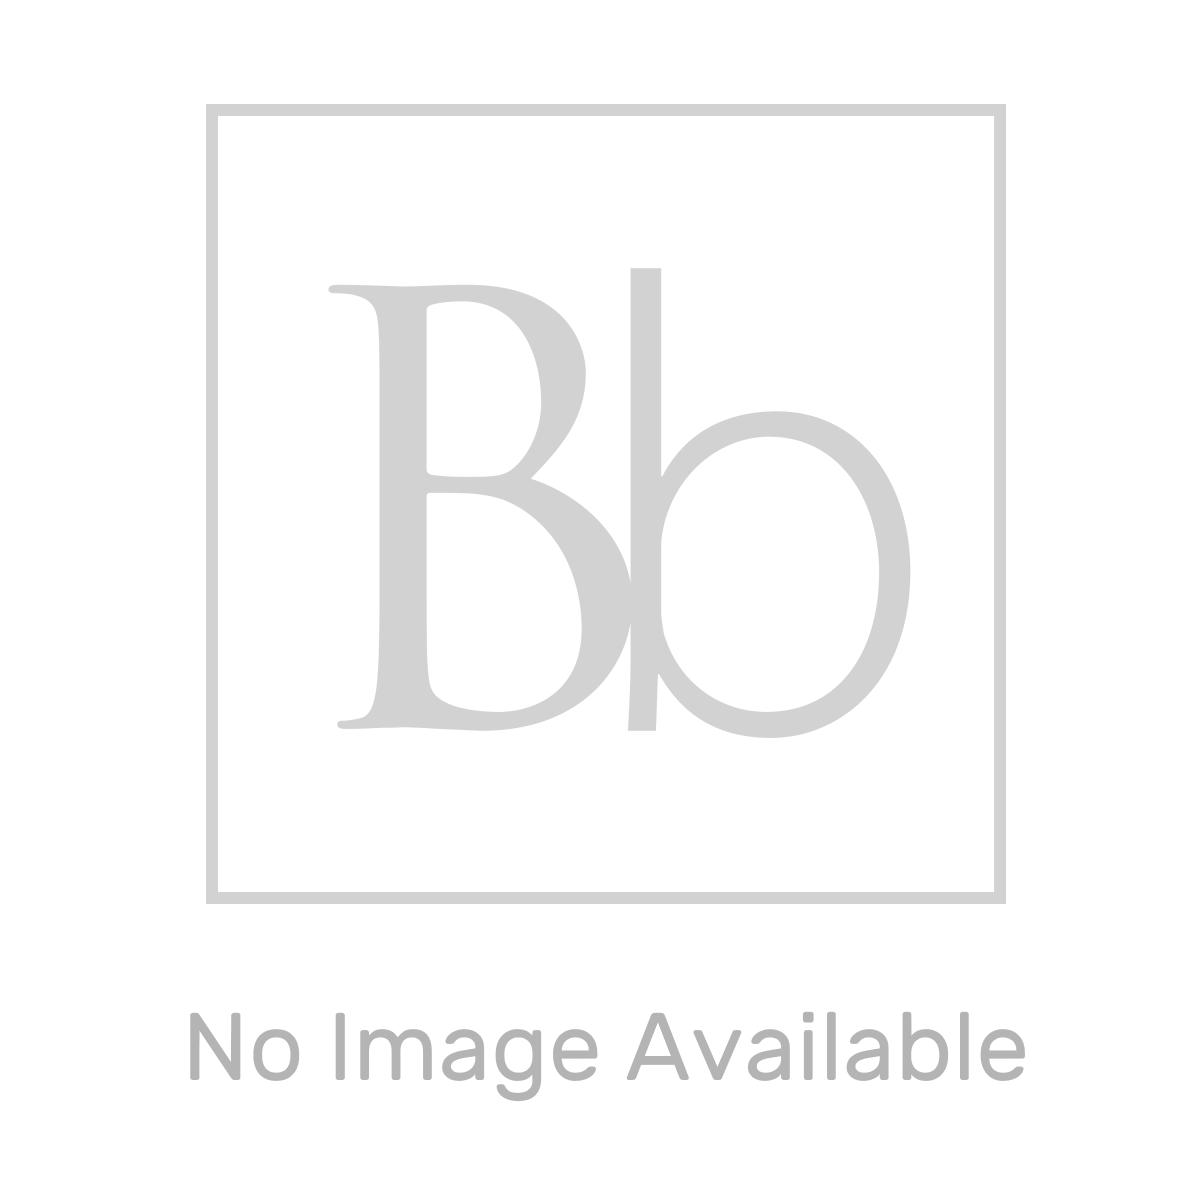 RAK Sensation Gloss White 1 Tap Hole Wall Hung Basin 500mm